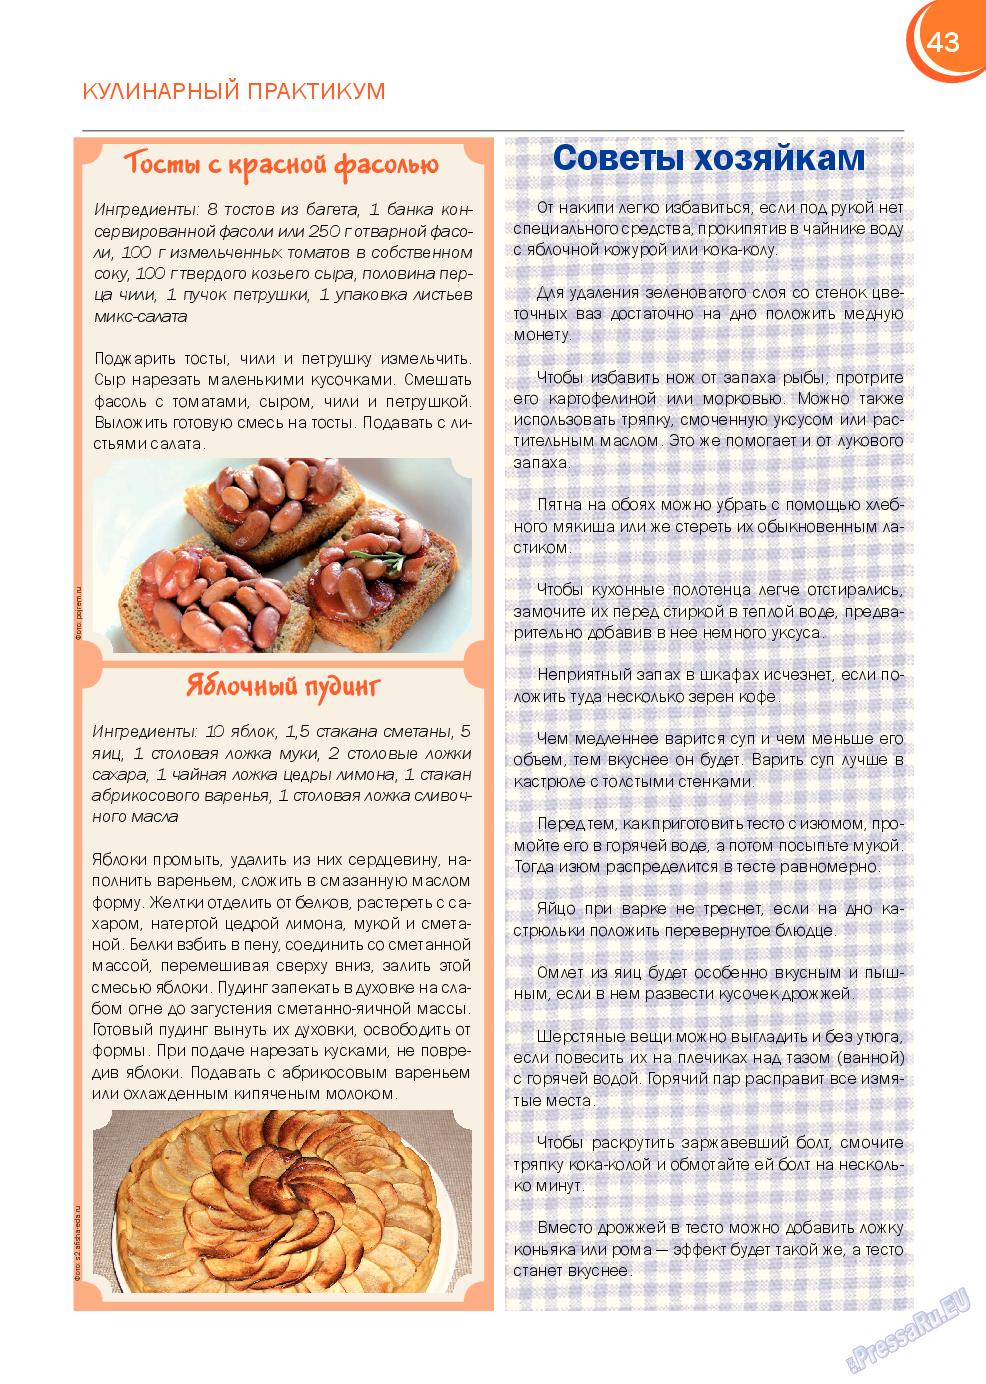 Русский Баден-Вюртемберг (журнал). 2014 год, номер 43, стр. 43